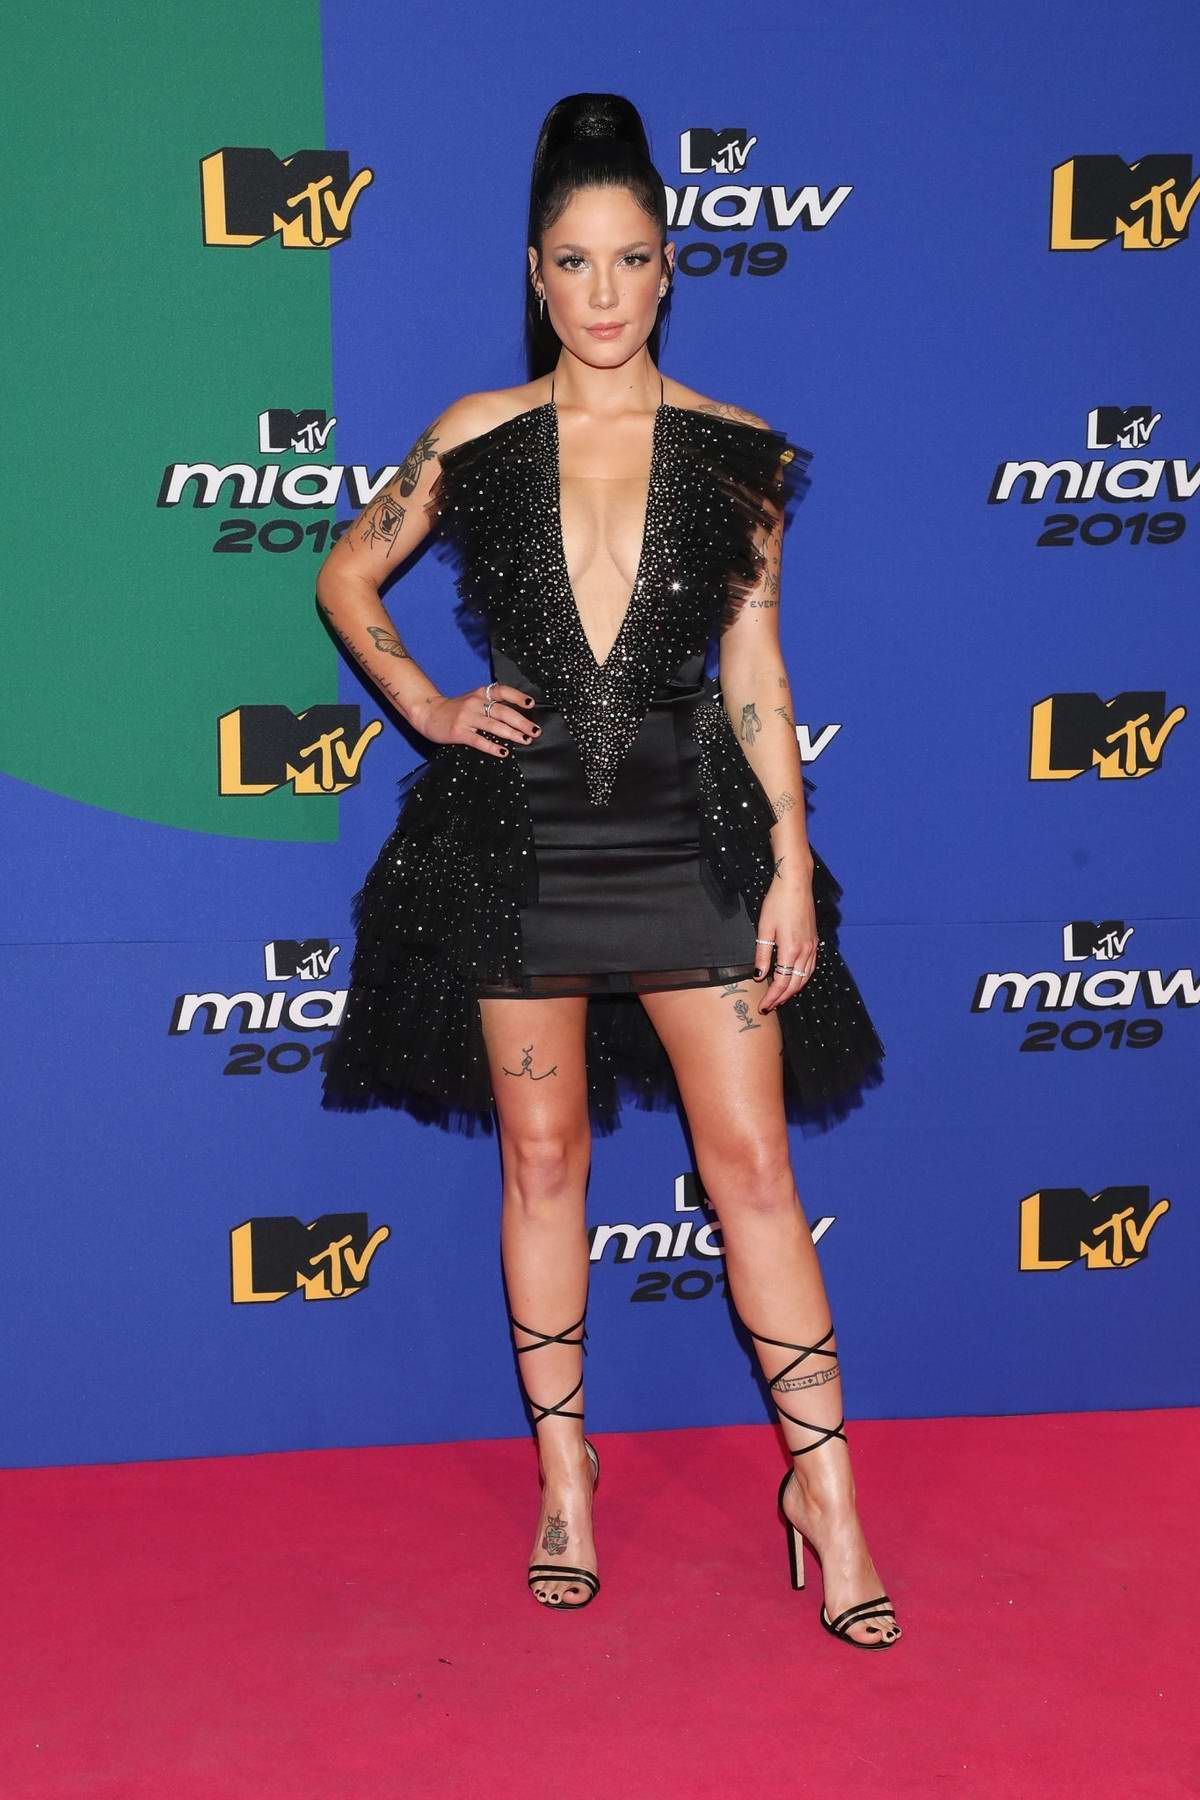 Halsey attends the red carpet of the MTV MIAW Awards at Palacio de los Deportes in Mexico City, Mexico